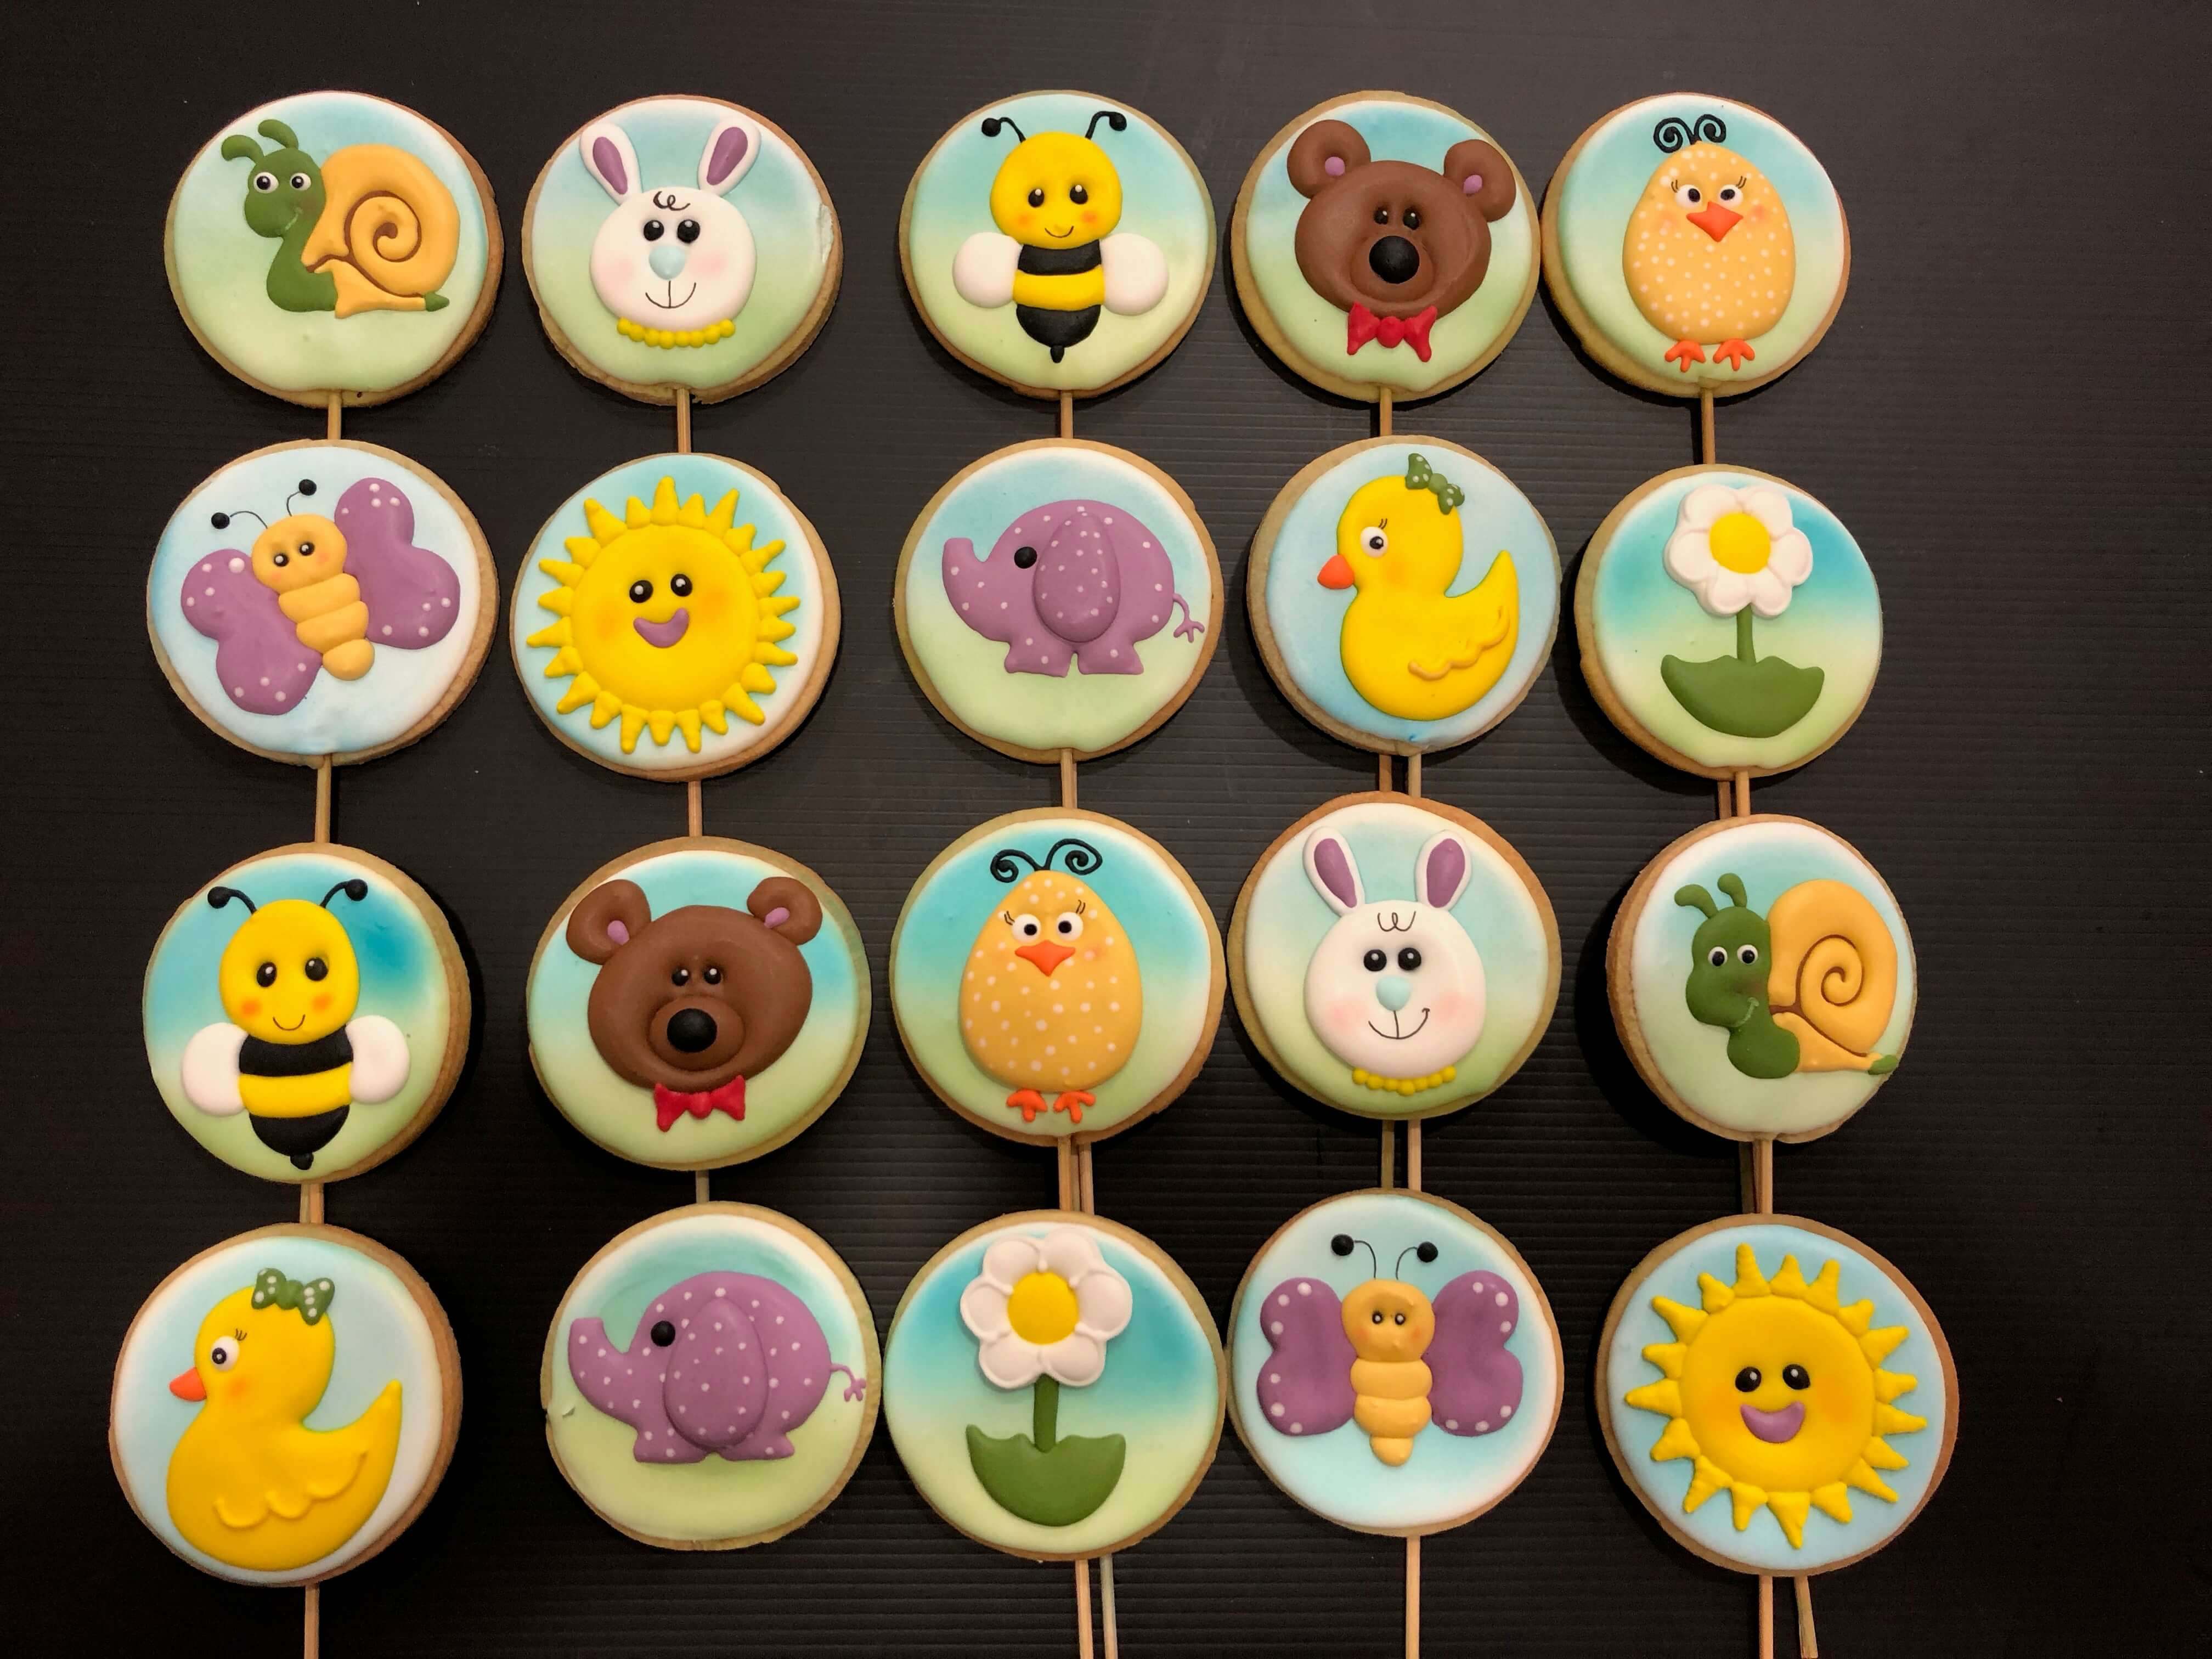 Galletas decoradas personalizadas animales animalito pollito abeja conejo coruña